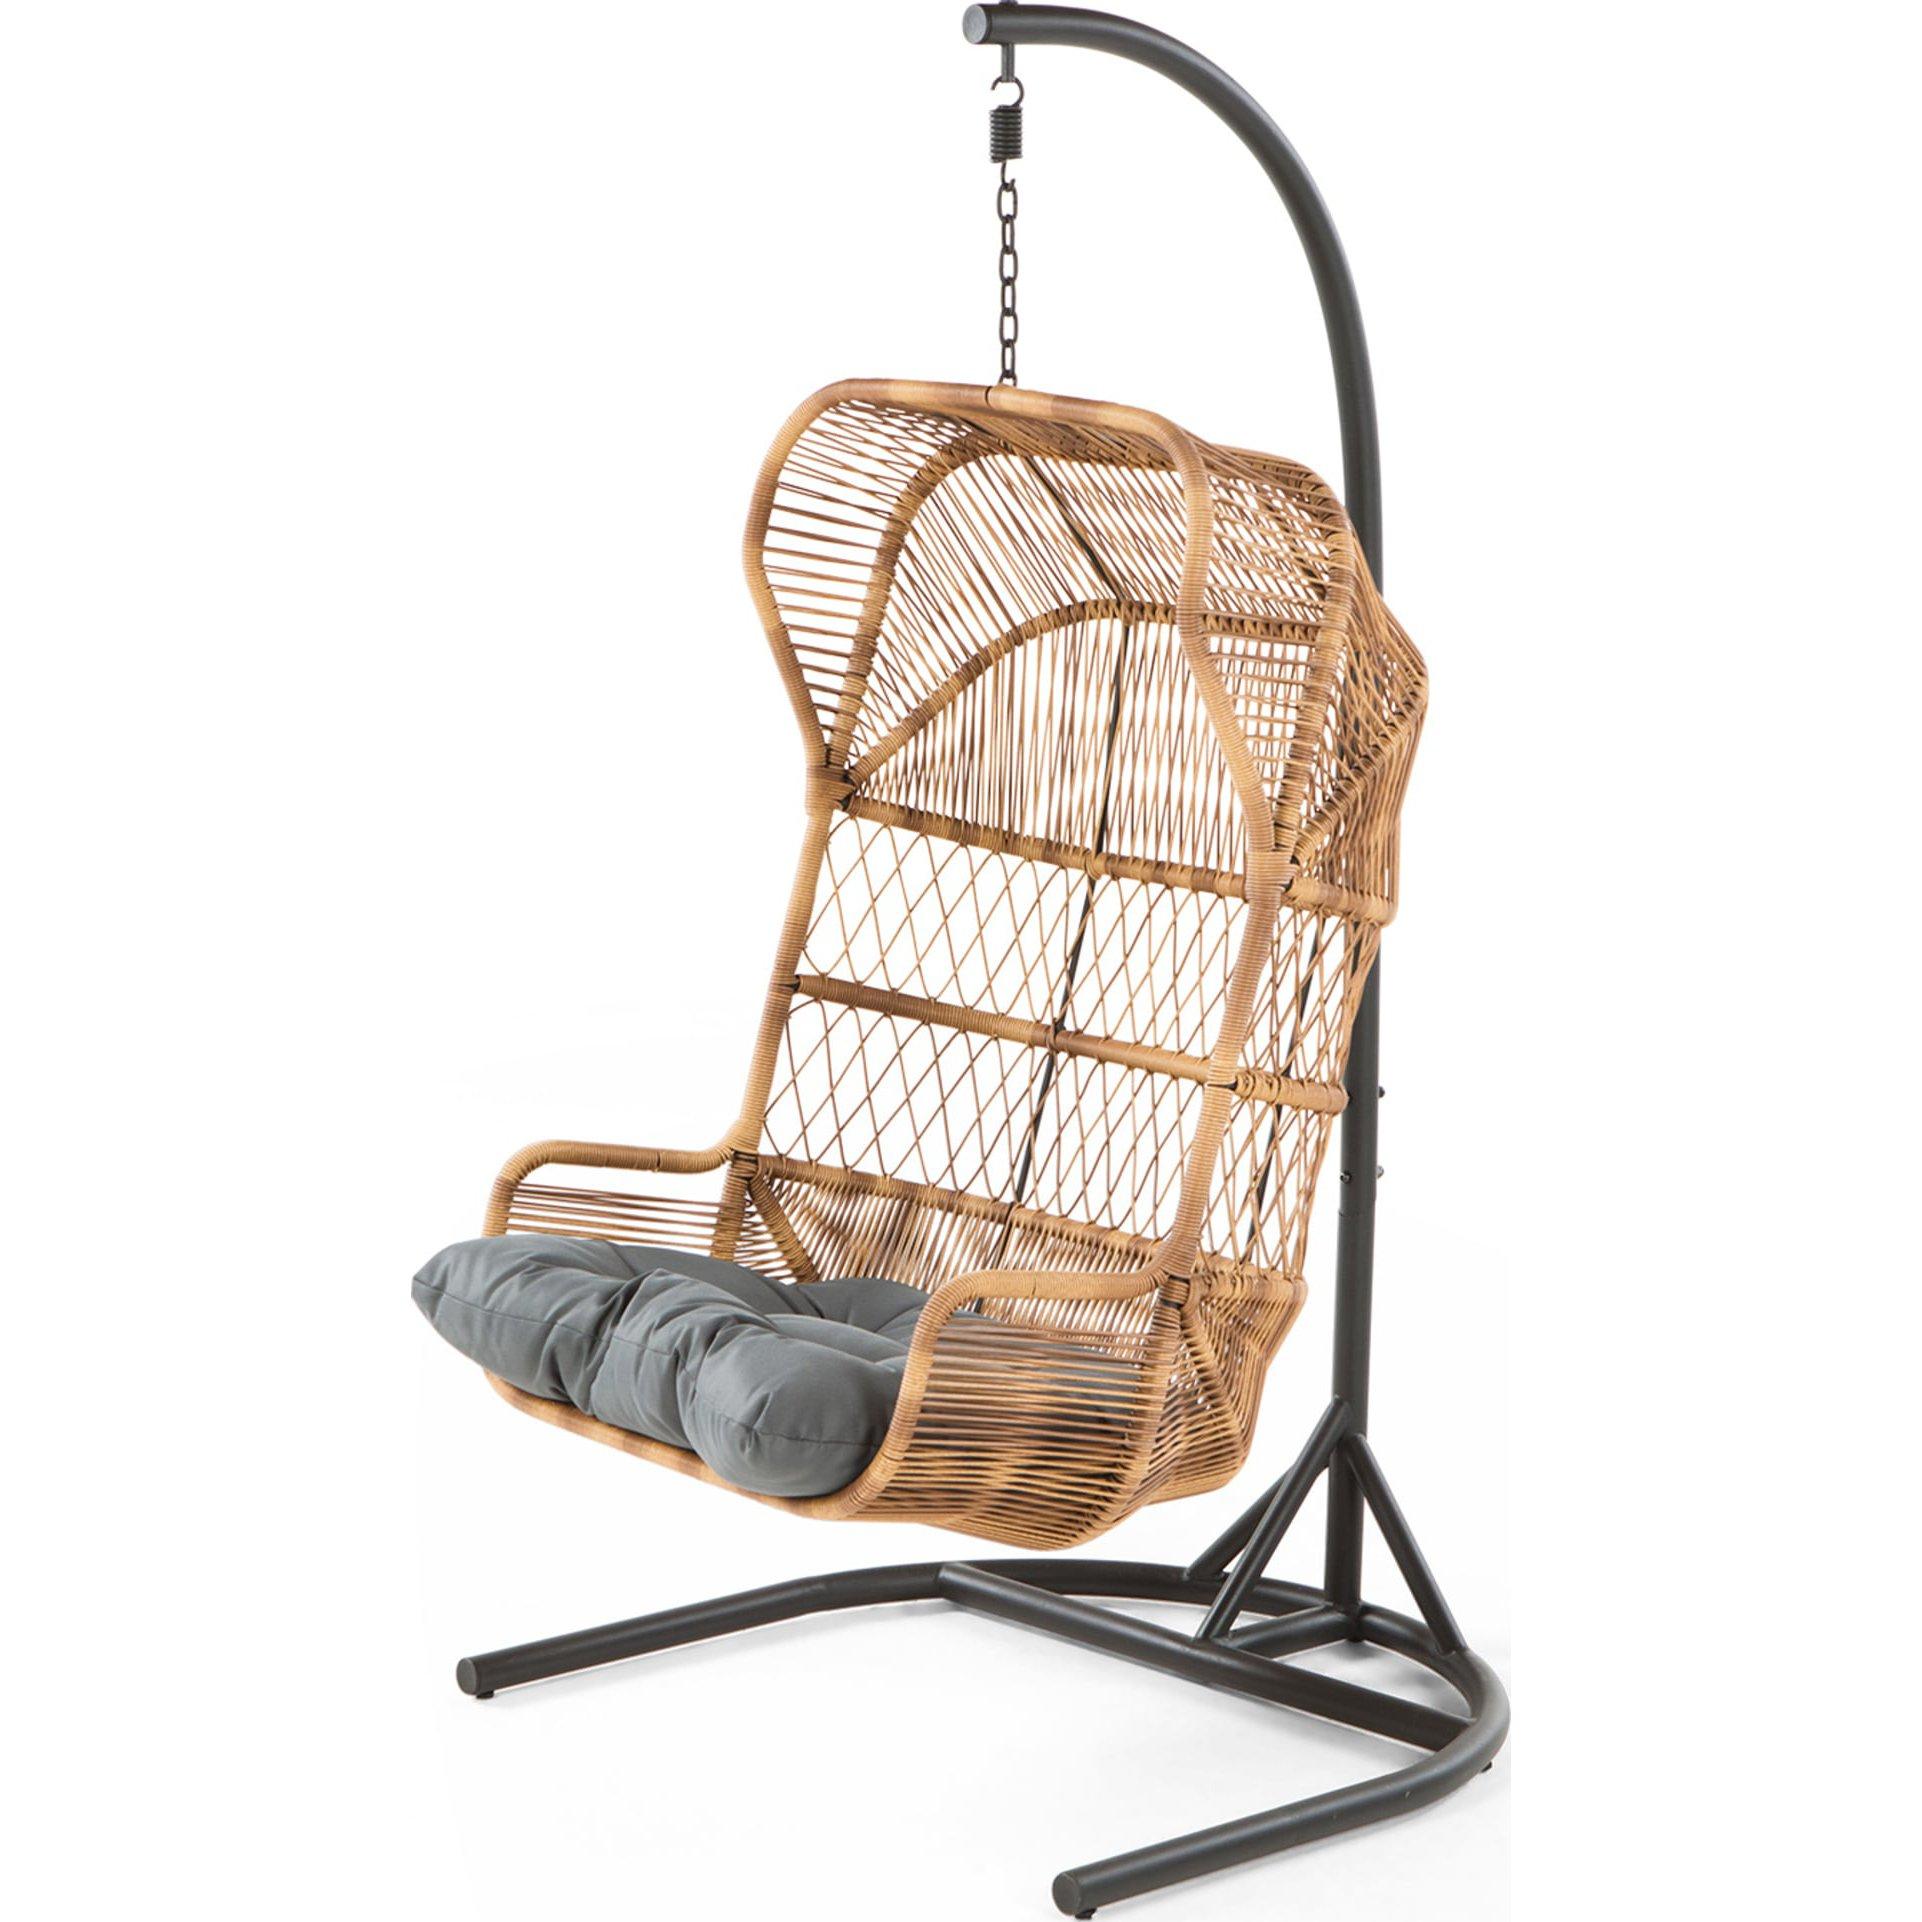 image-Lyra Garden Hanging Chair, Charcoal Grey